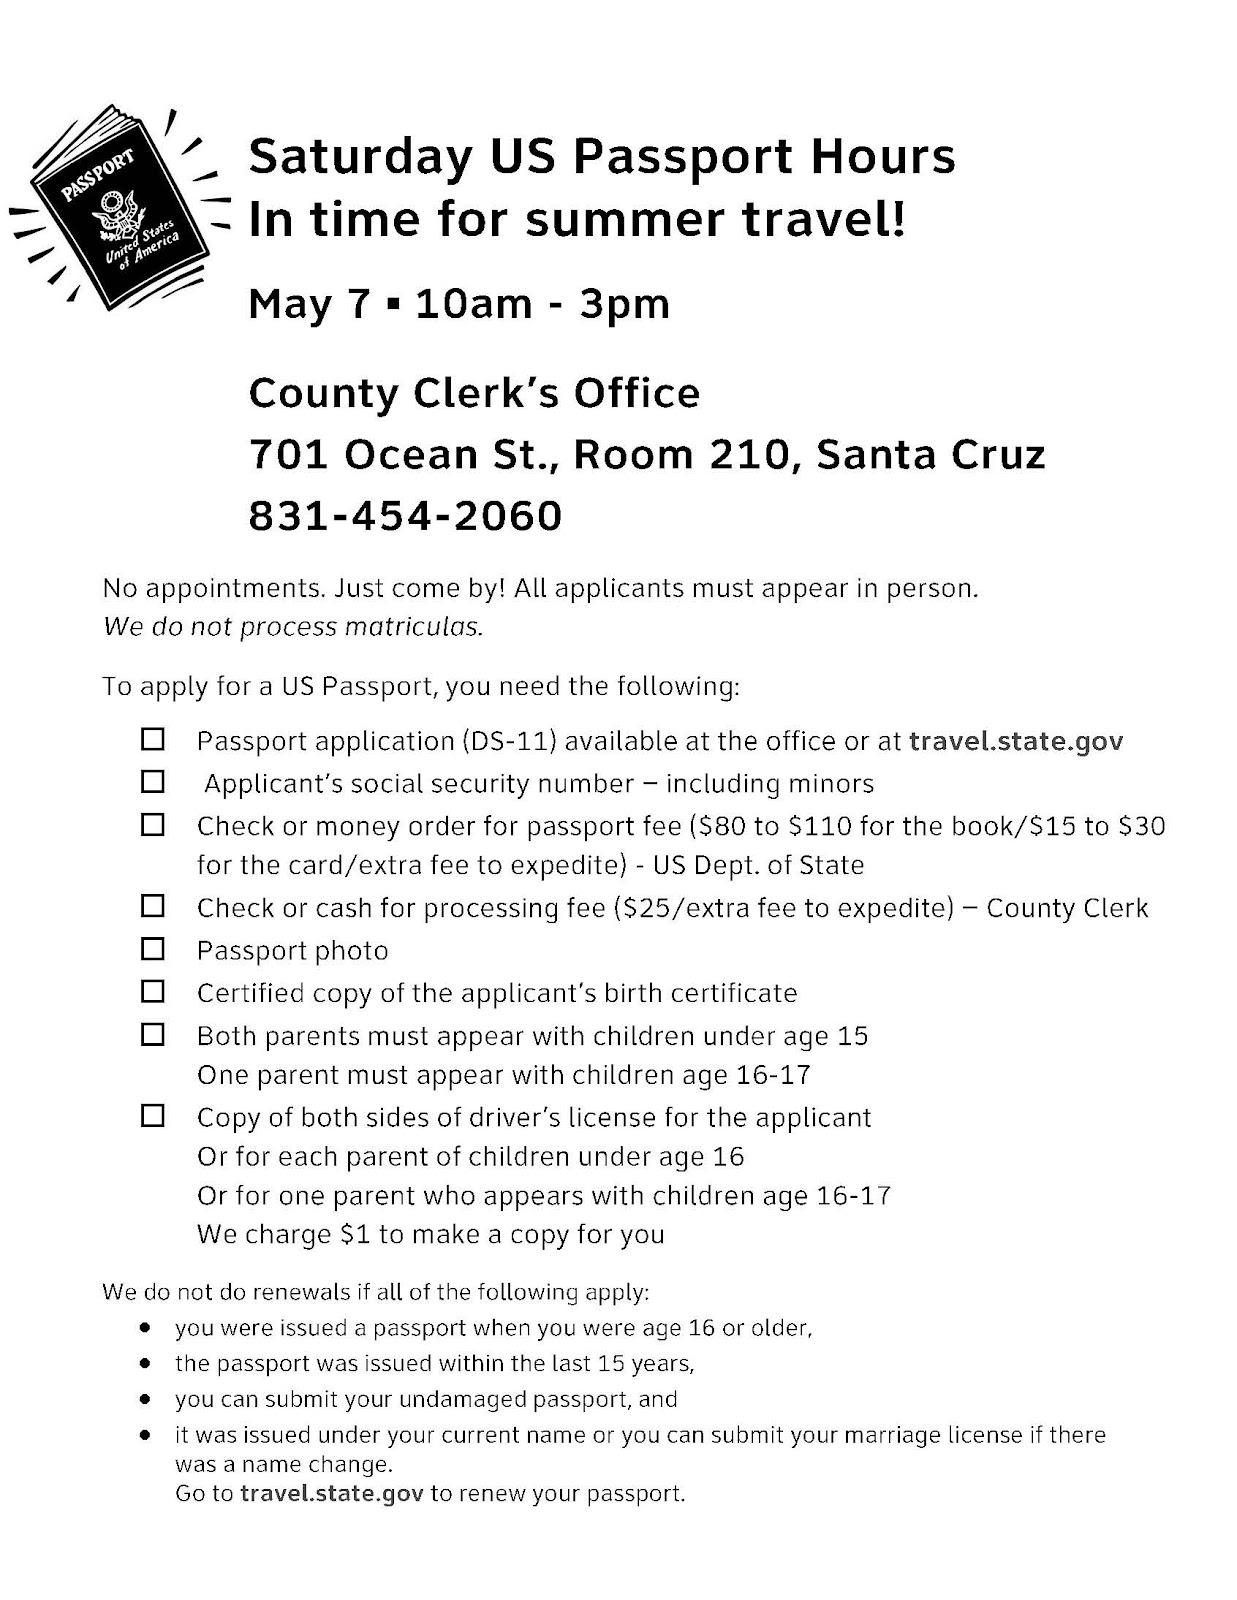 Passport Hours For Schools Mayg